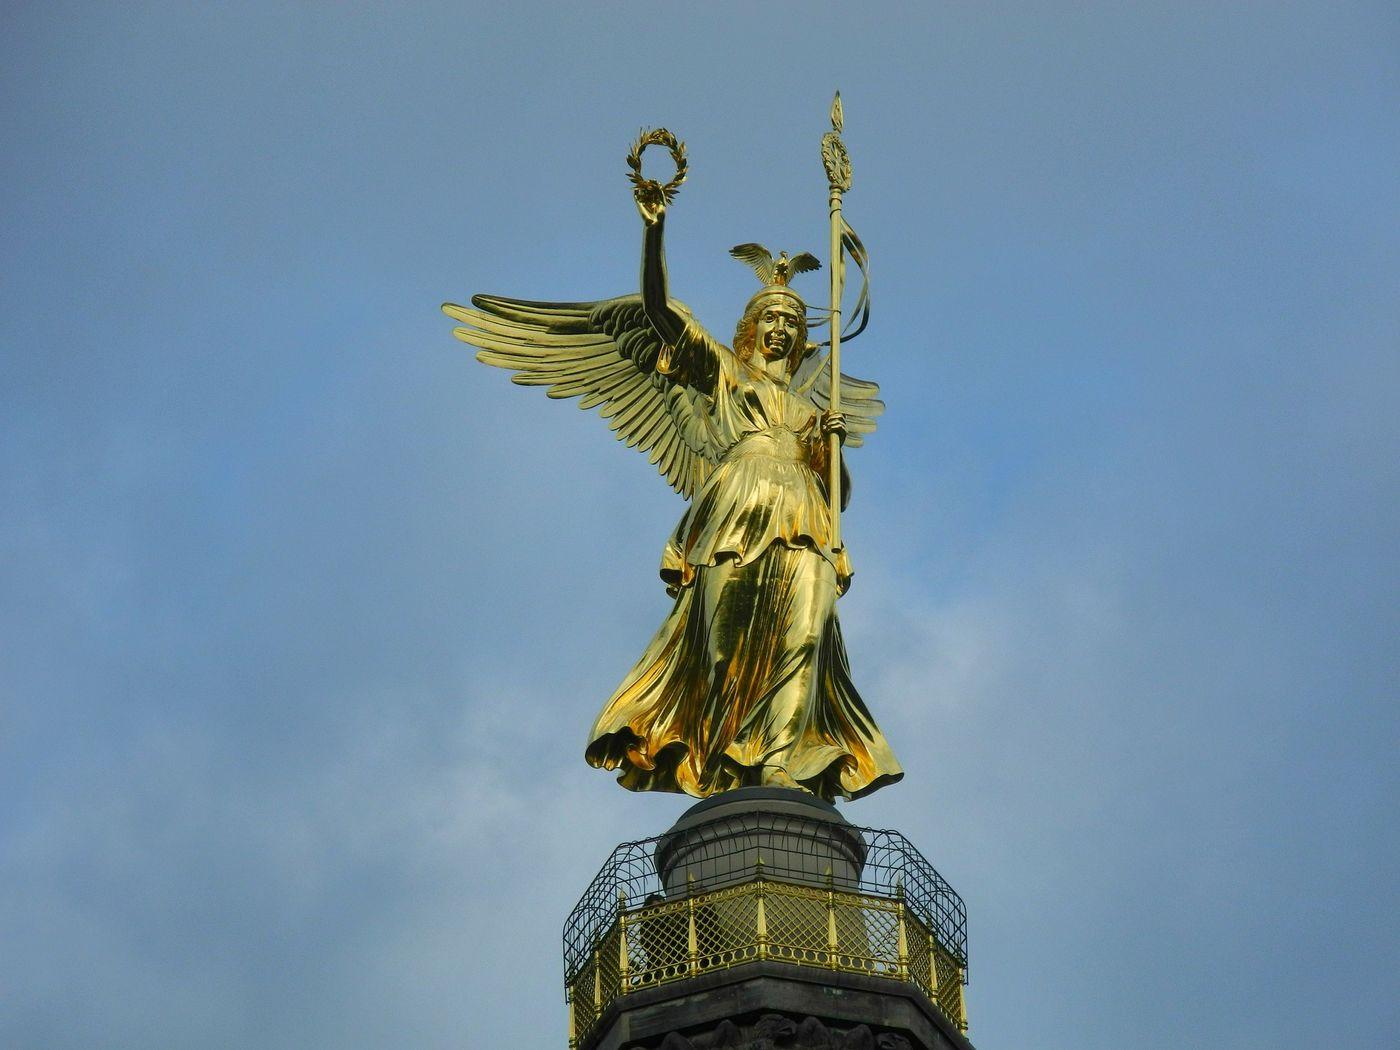 Siegessaule Berlín